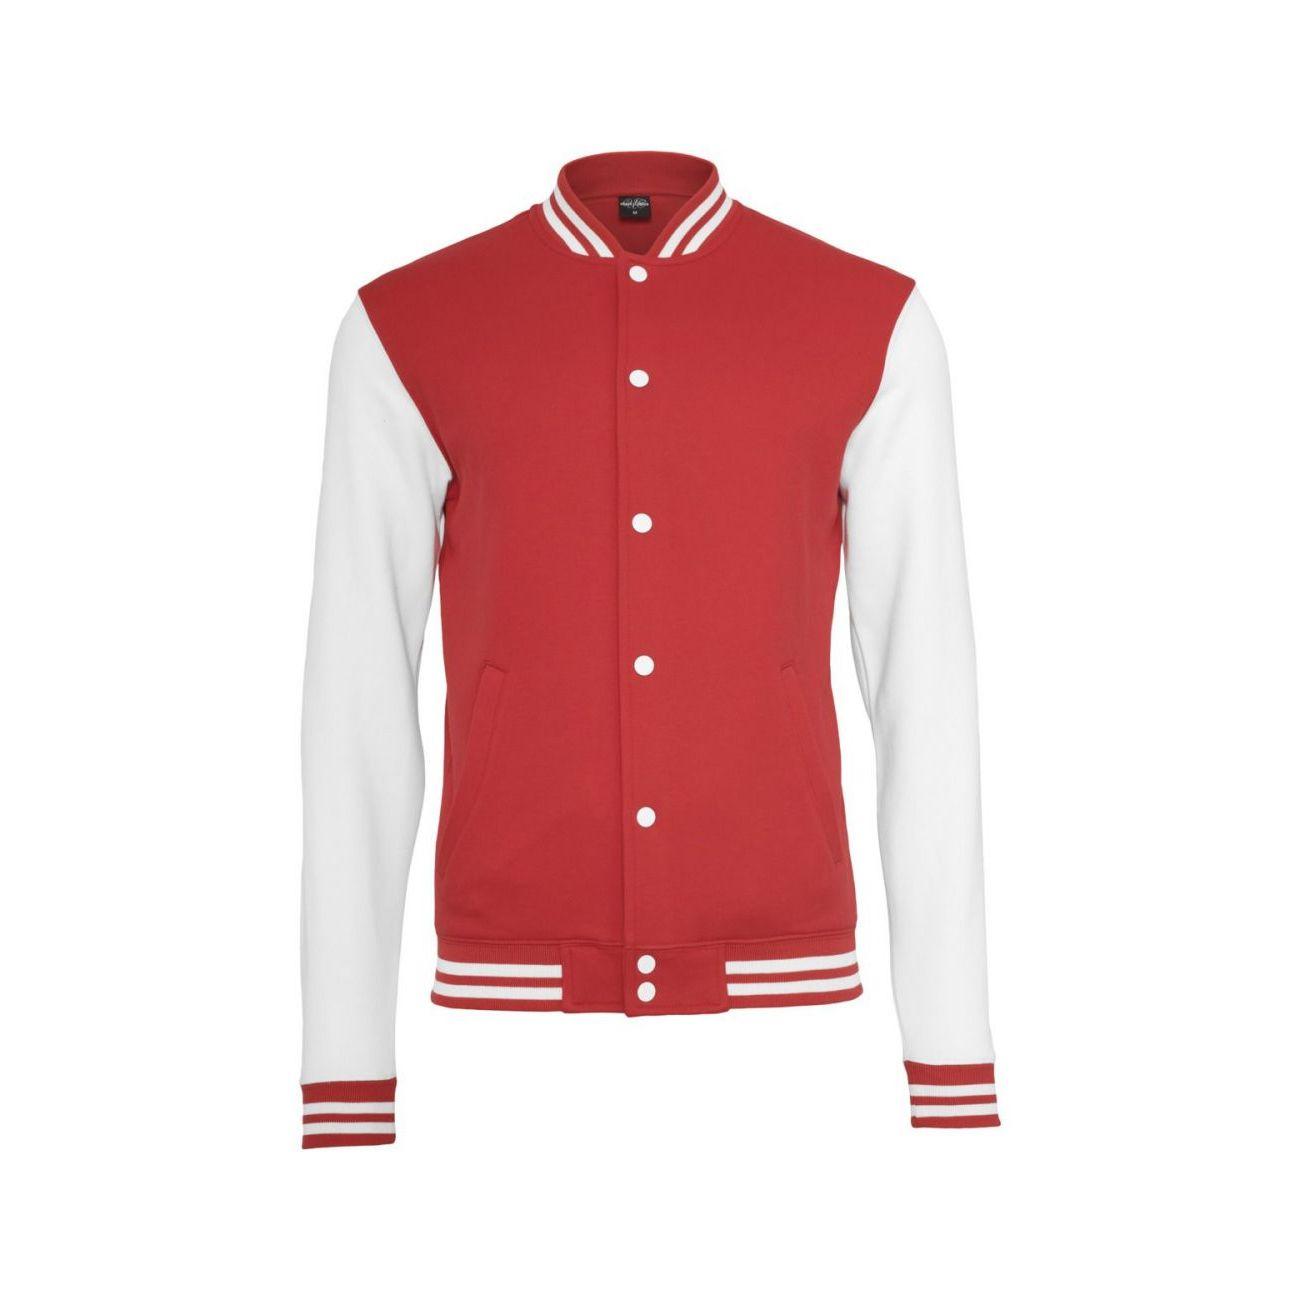 Blanc College Urban Classics Adulte Mode Style Lifestyle Tone 2 Rouge Teddy Veste NOymw0nv8